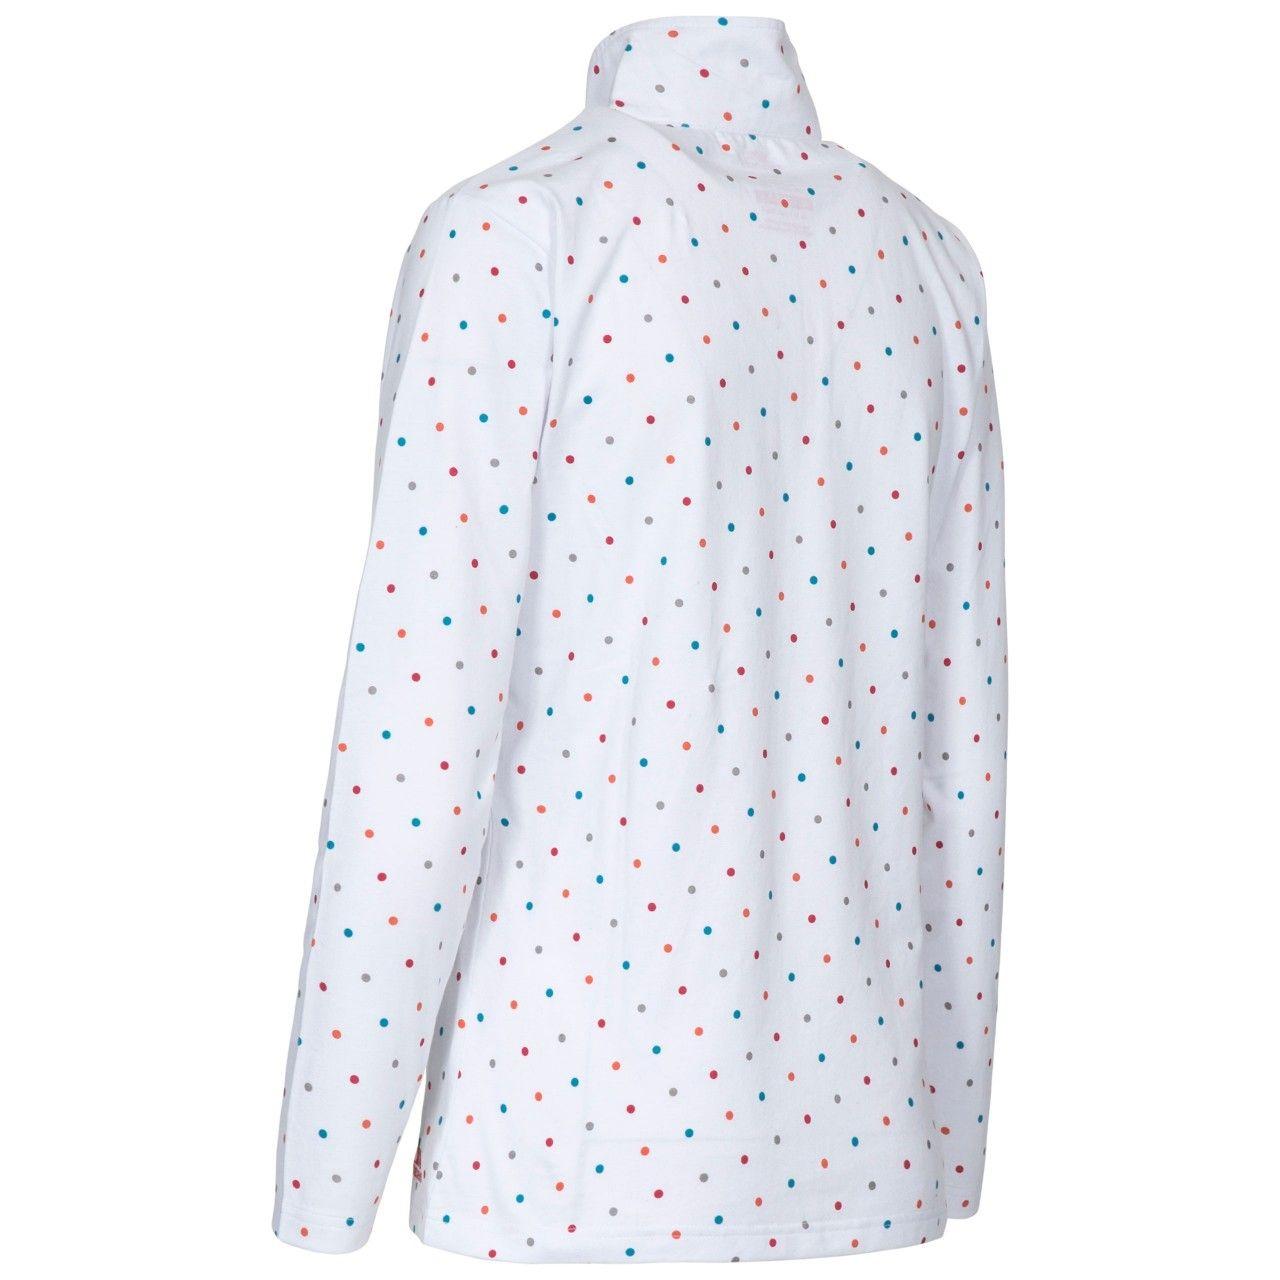 Trespass Womens/Ladies Betty II 1/2 Zip Long Sleeve Top